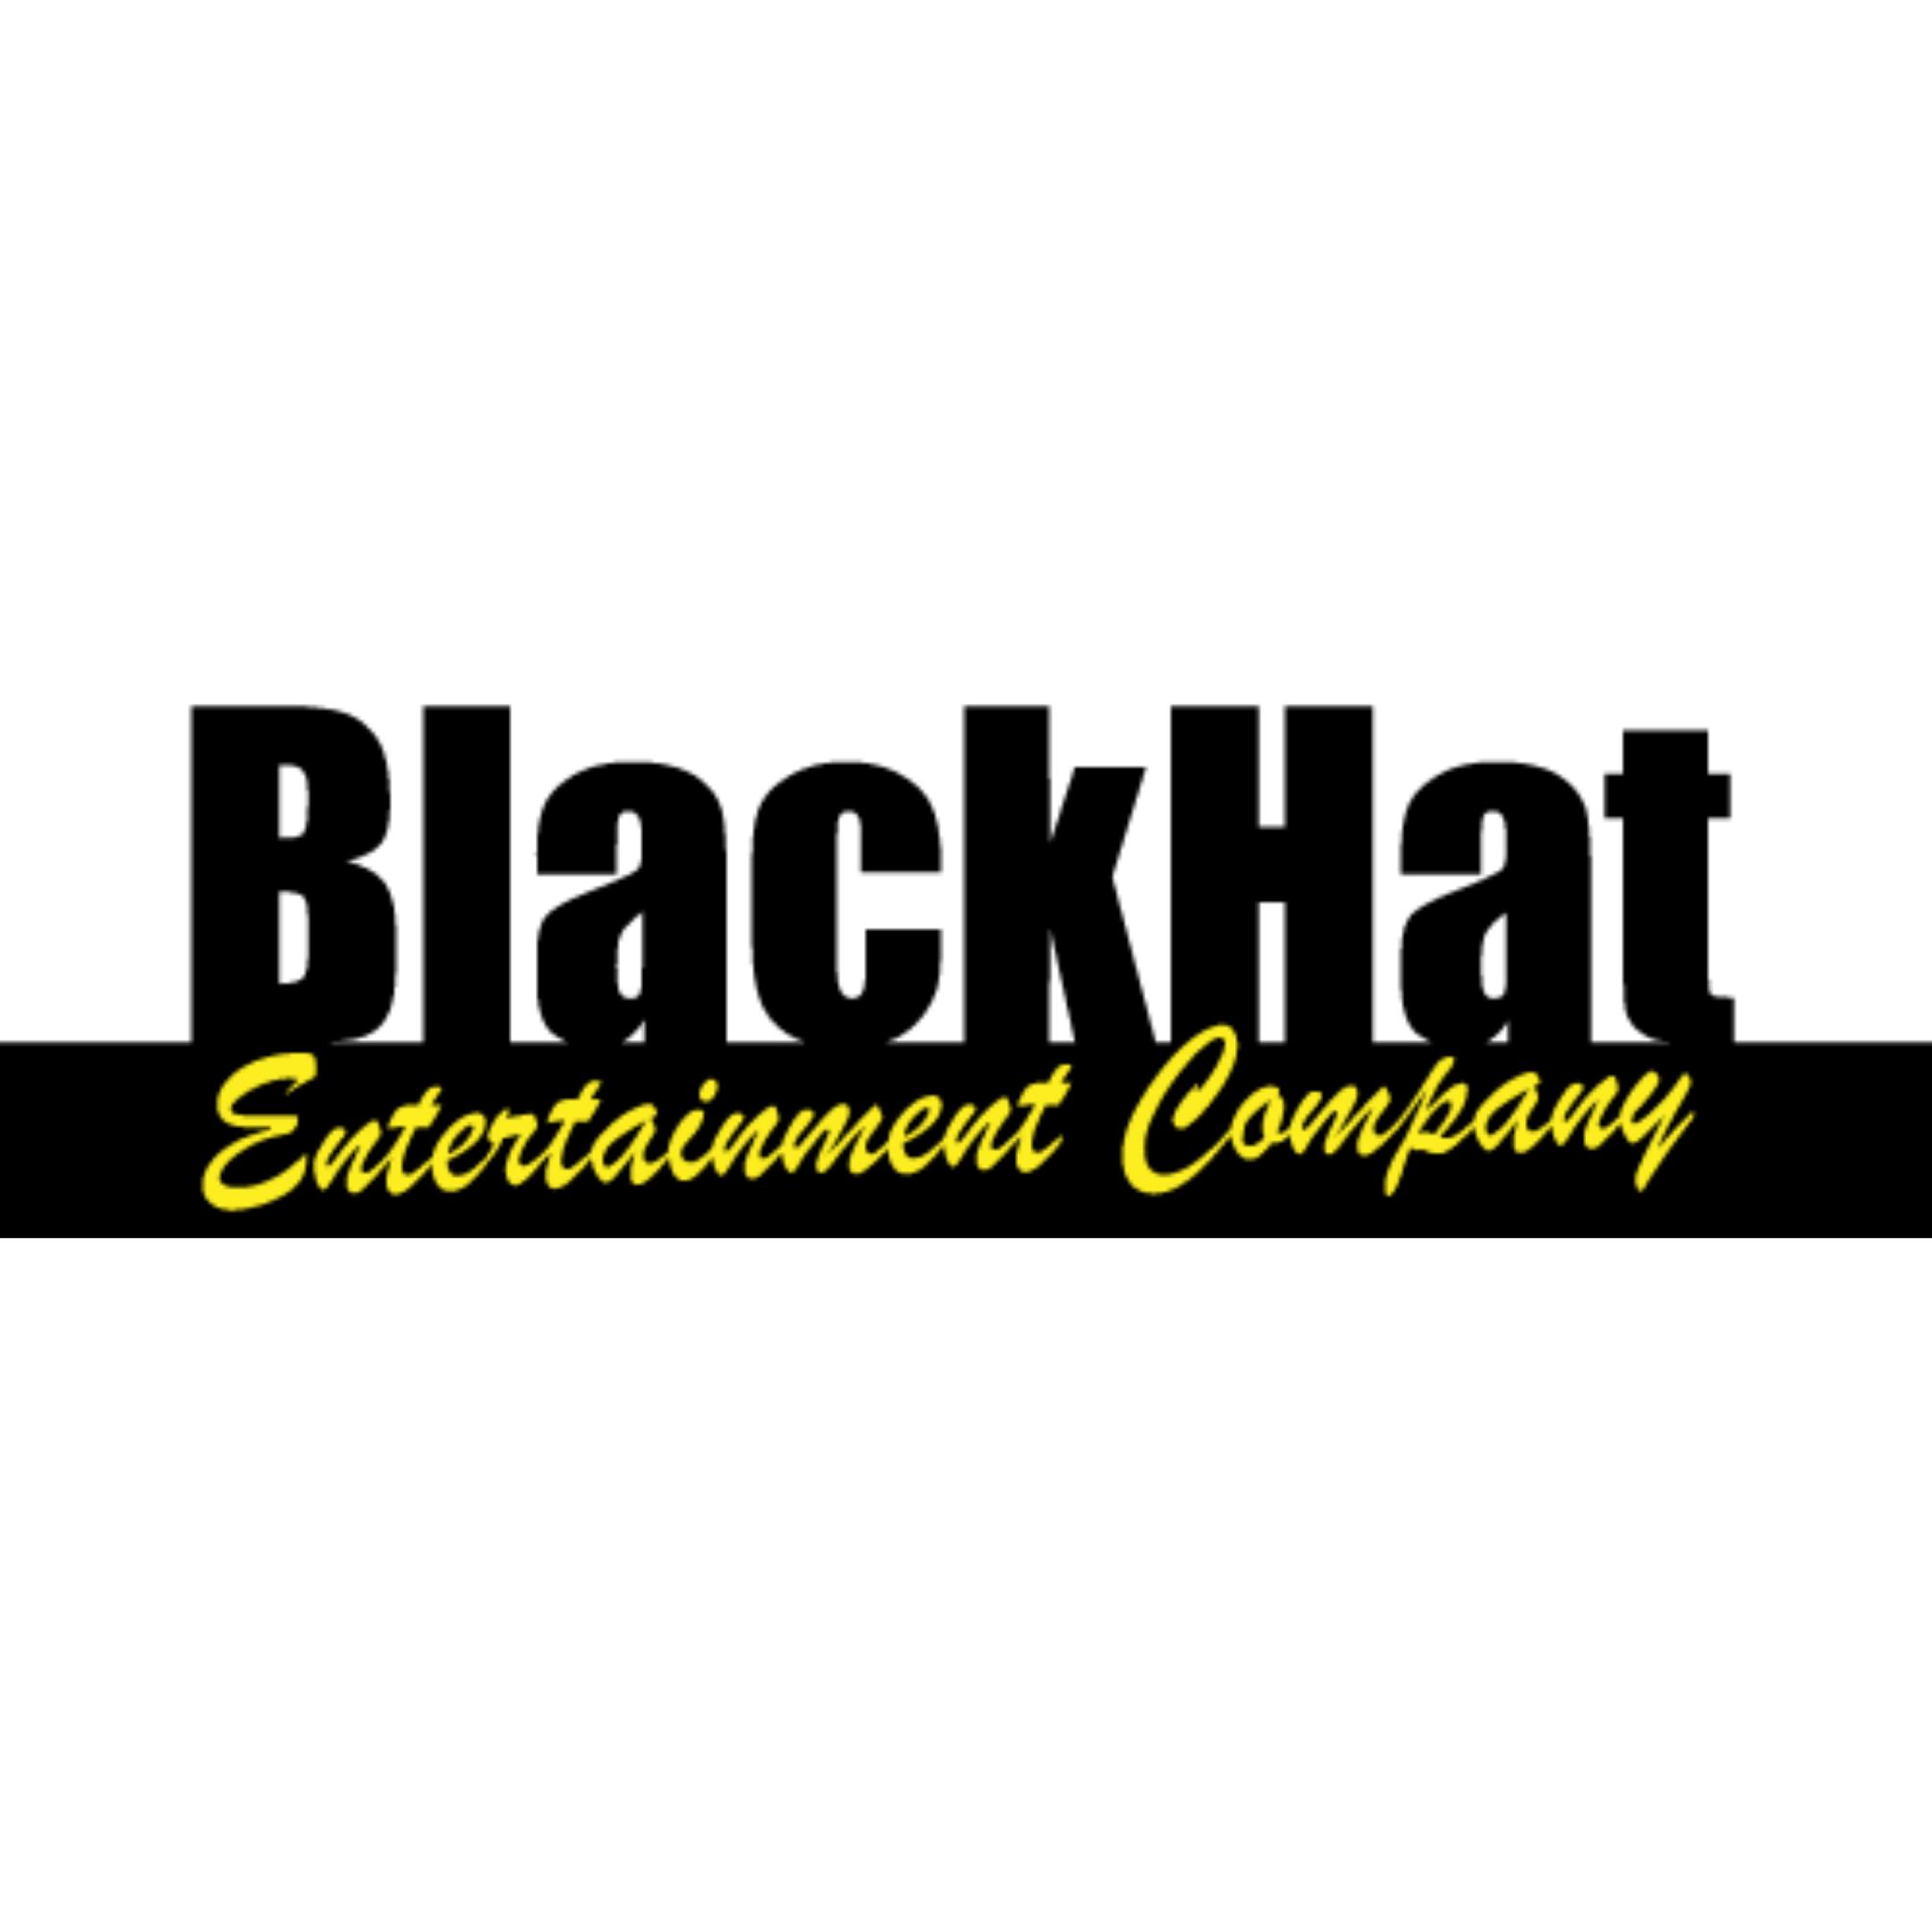 Blackhat Entertainment Company